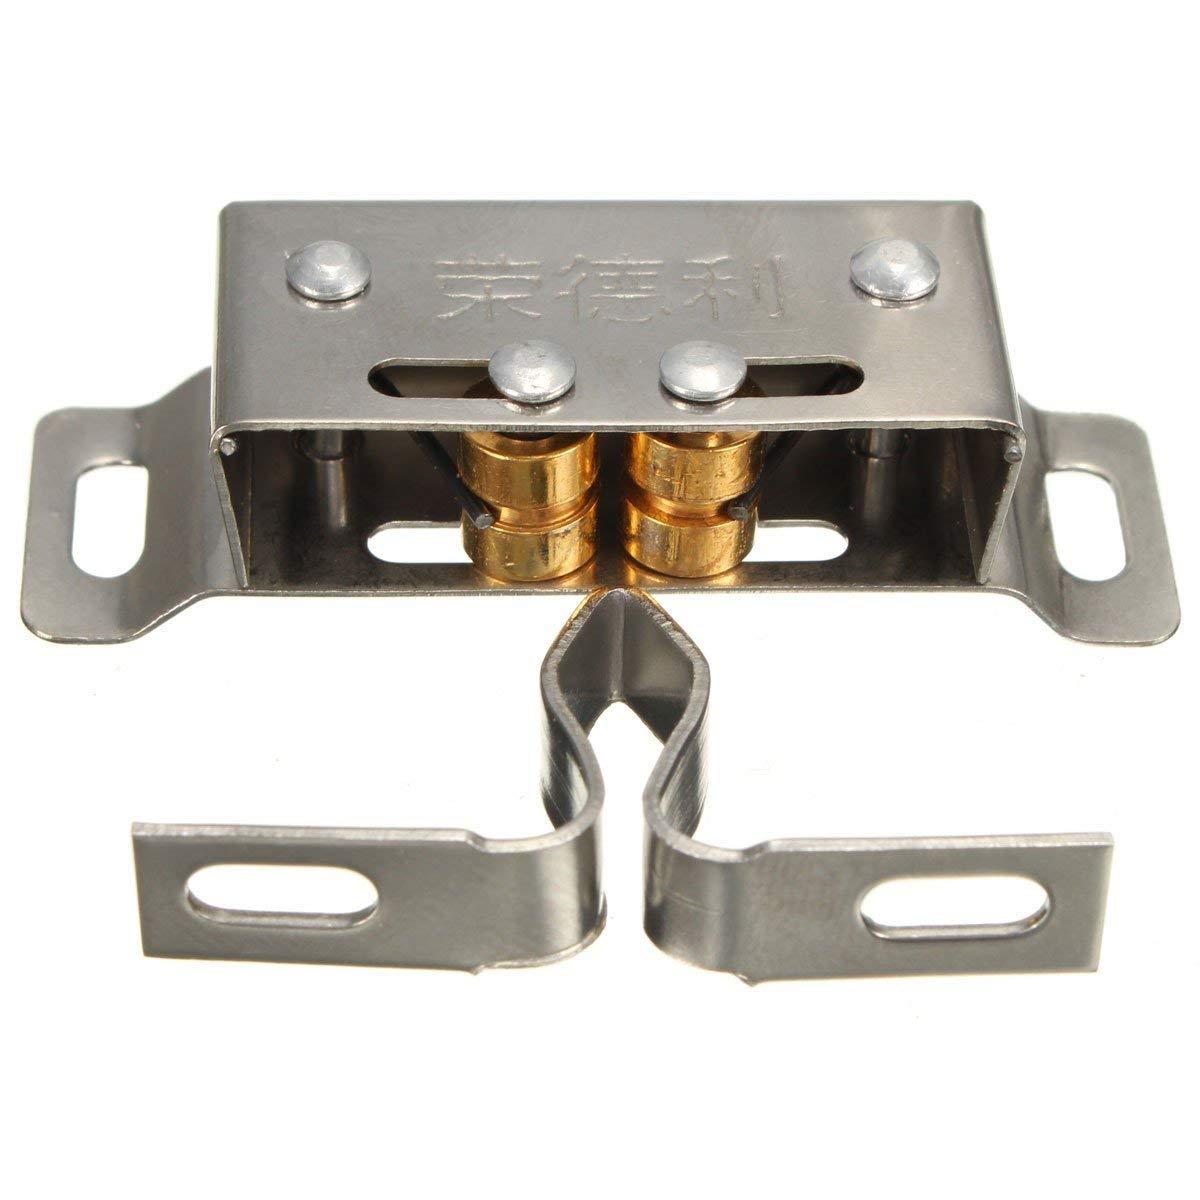 Kitchen Cabinet Catches - Metal Cabinet Catch - Stainless Steel Catch Stopper For Cupboard Cabinet Kitchen Door Latch Hardware (Cabinet Door Catch Latch)